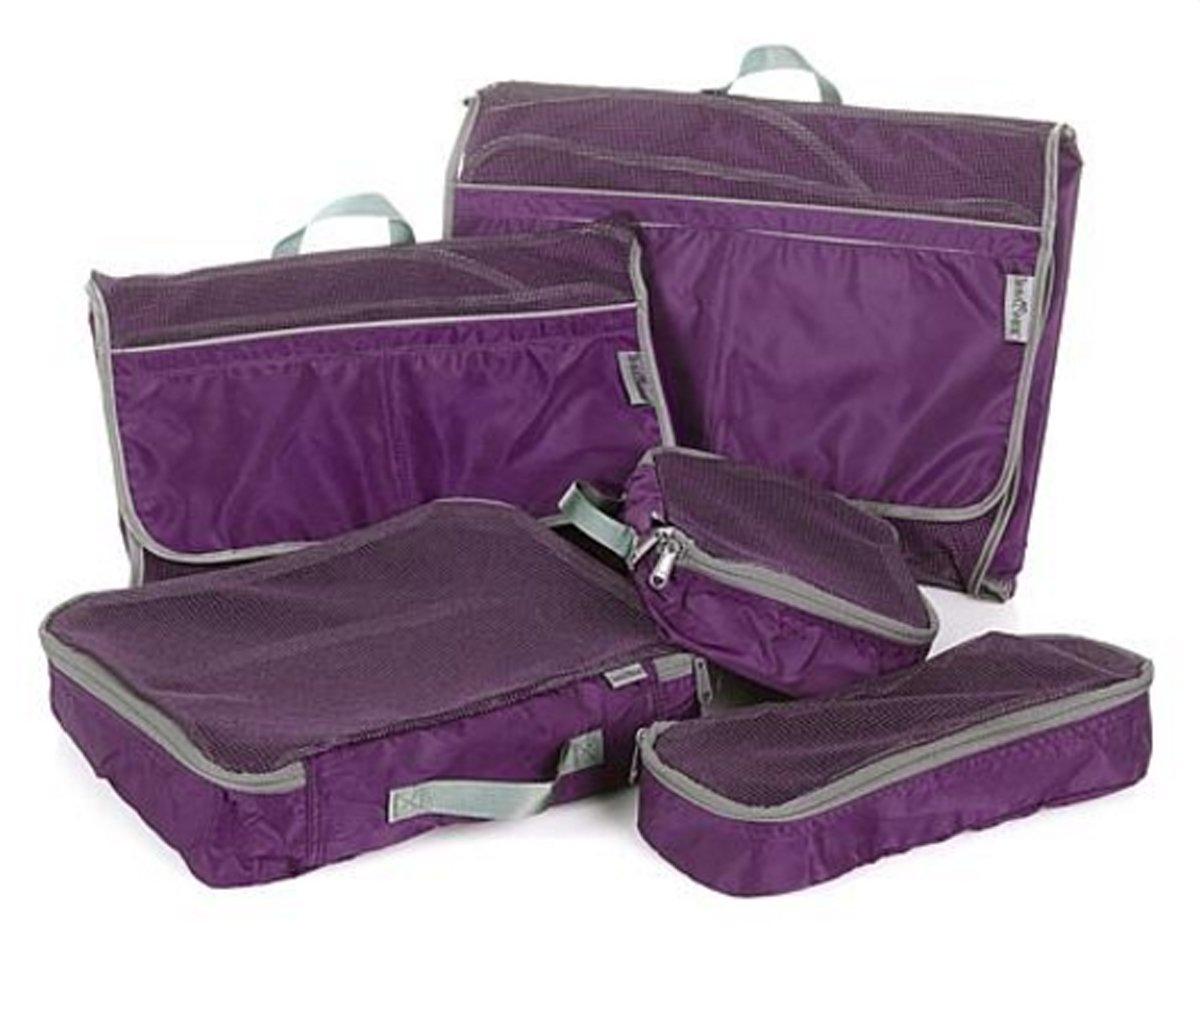 TravelSmith Smart Pack Organizers 5-piece Kit ~ Eggplant Purple